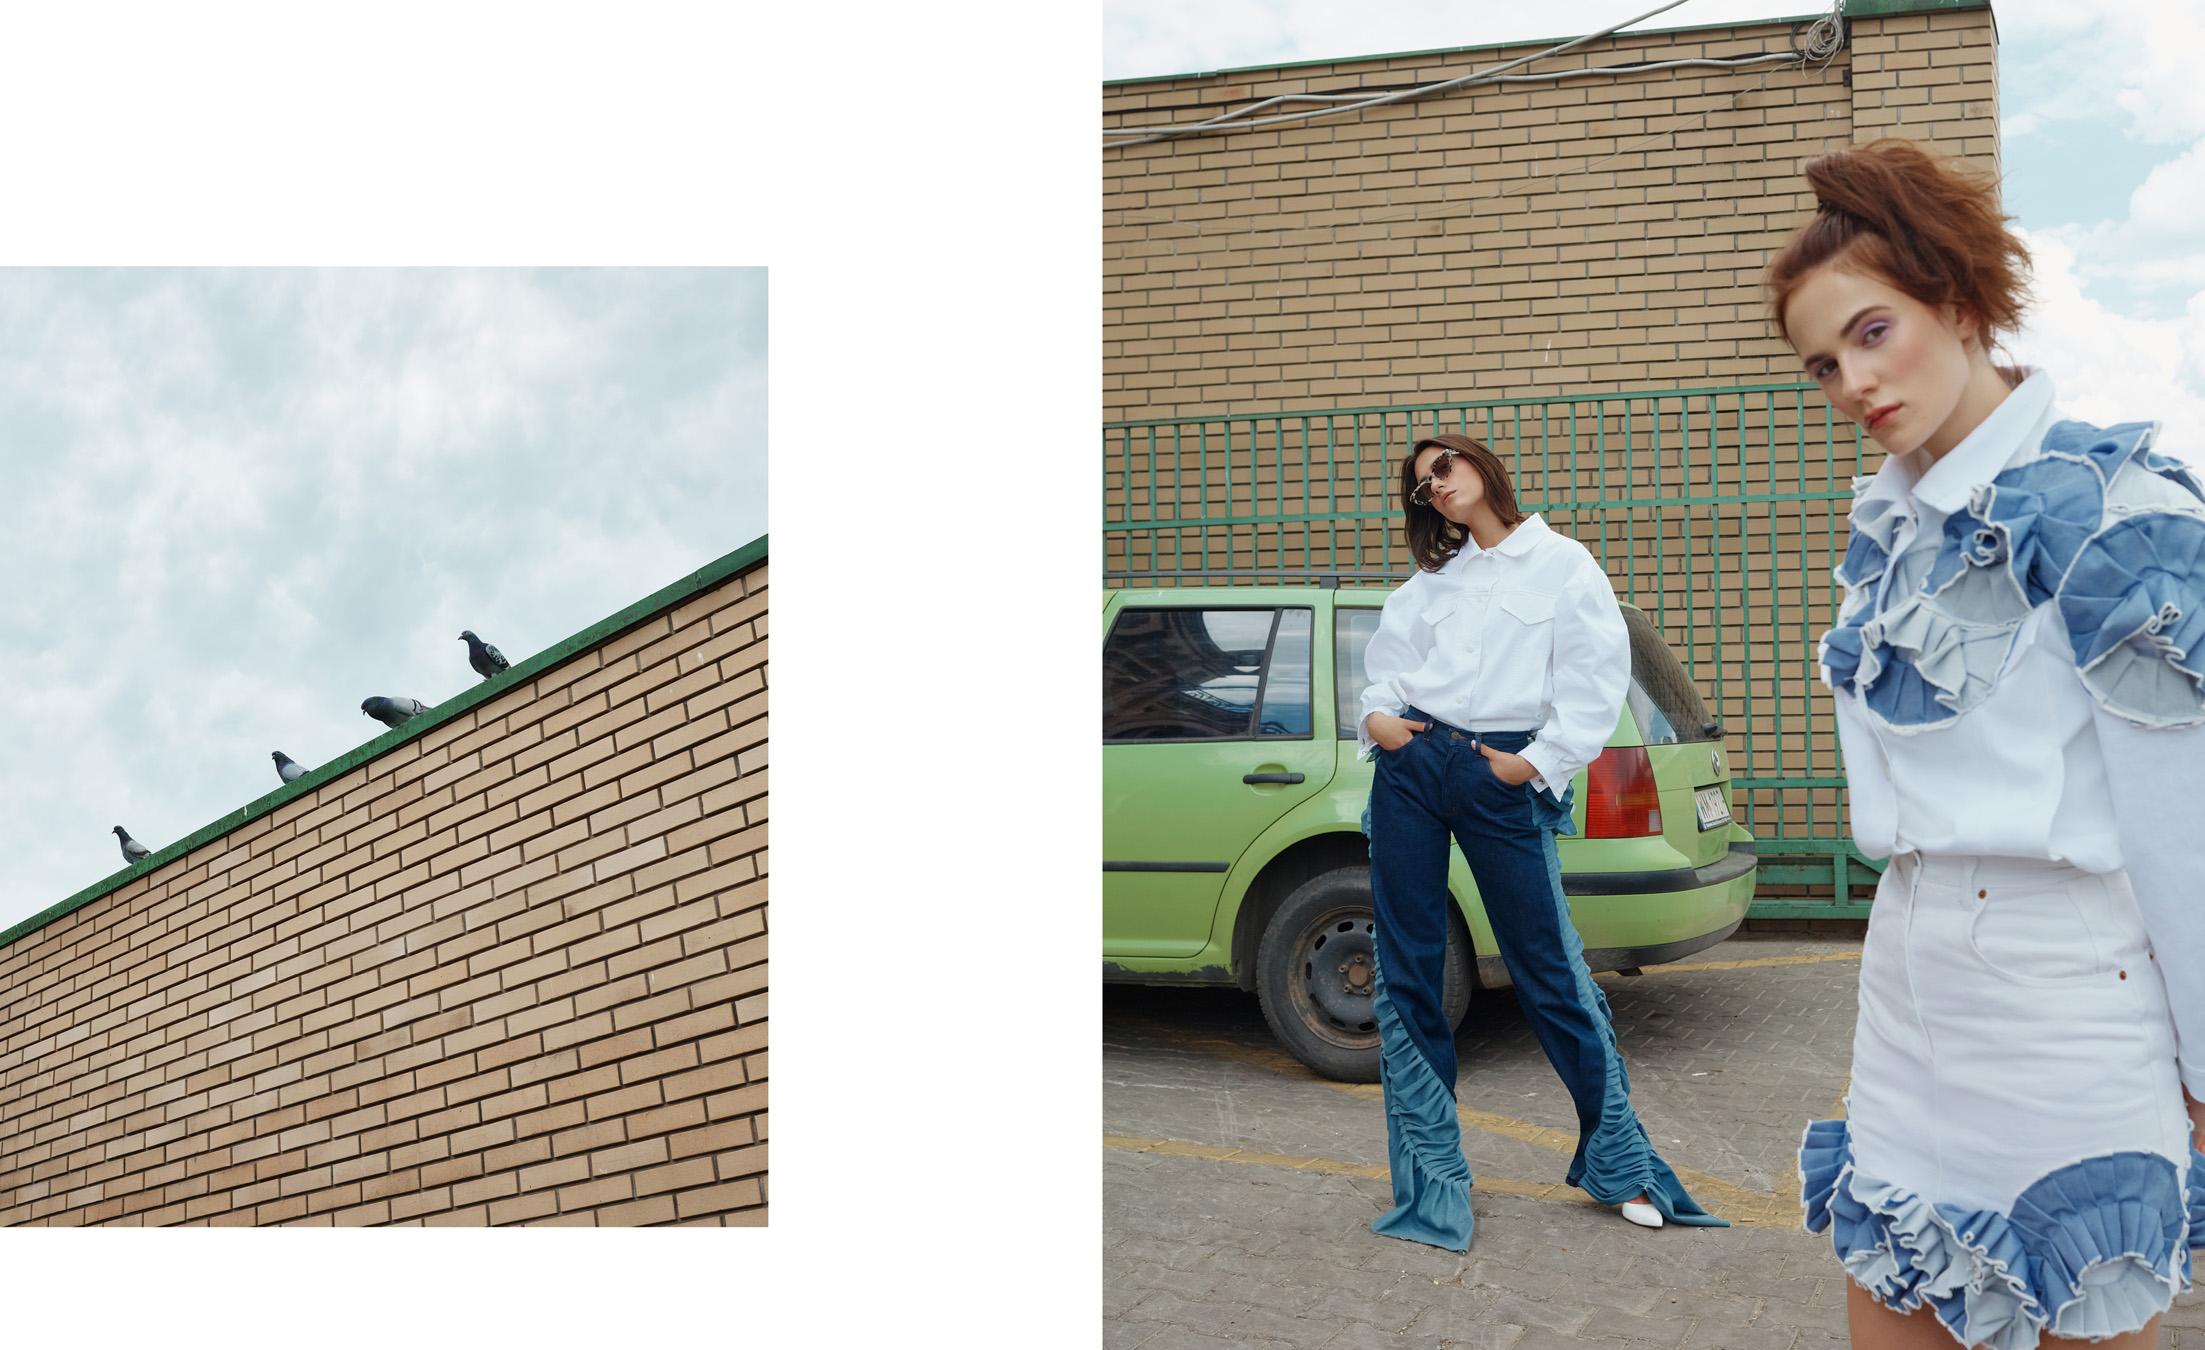 Karolina Miko / Campaign